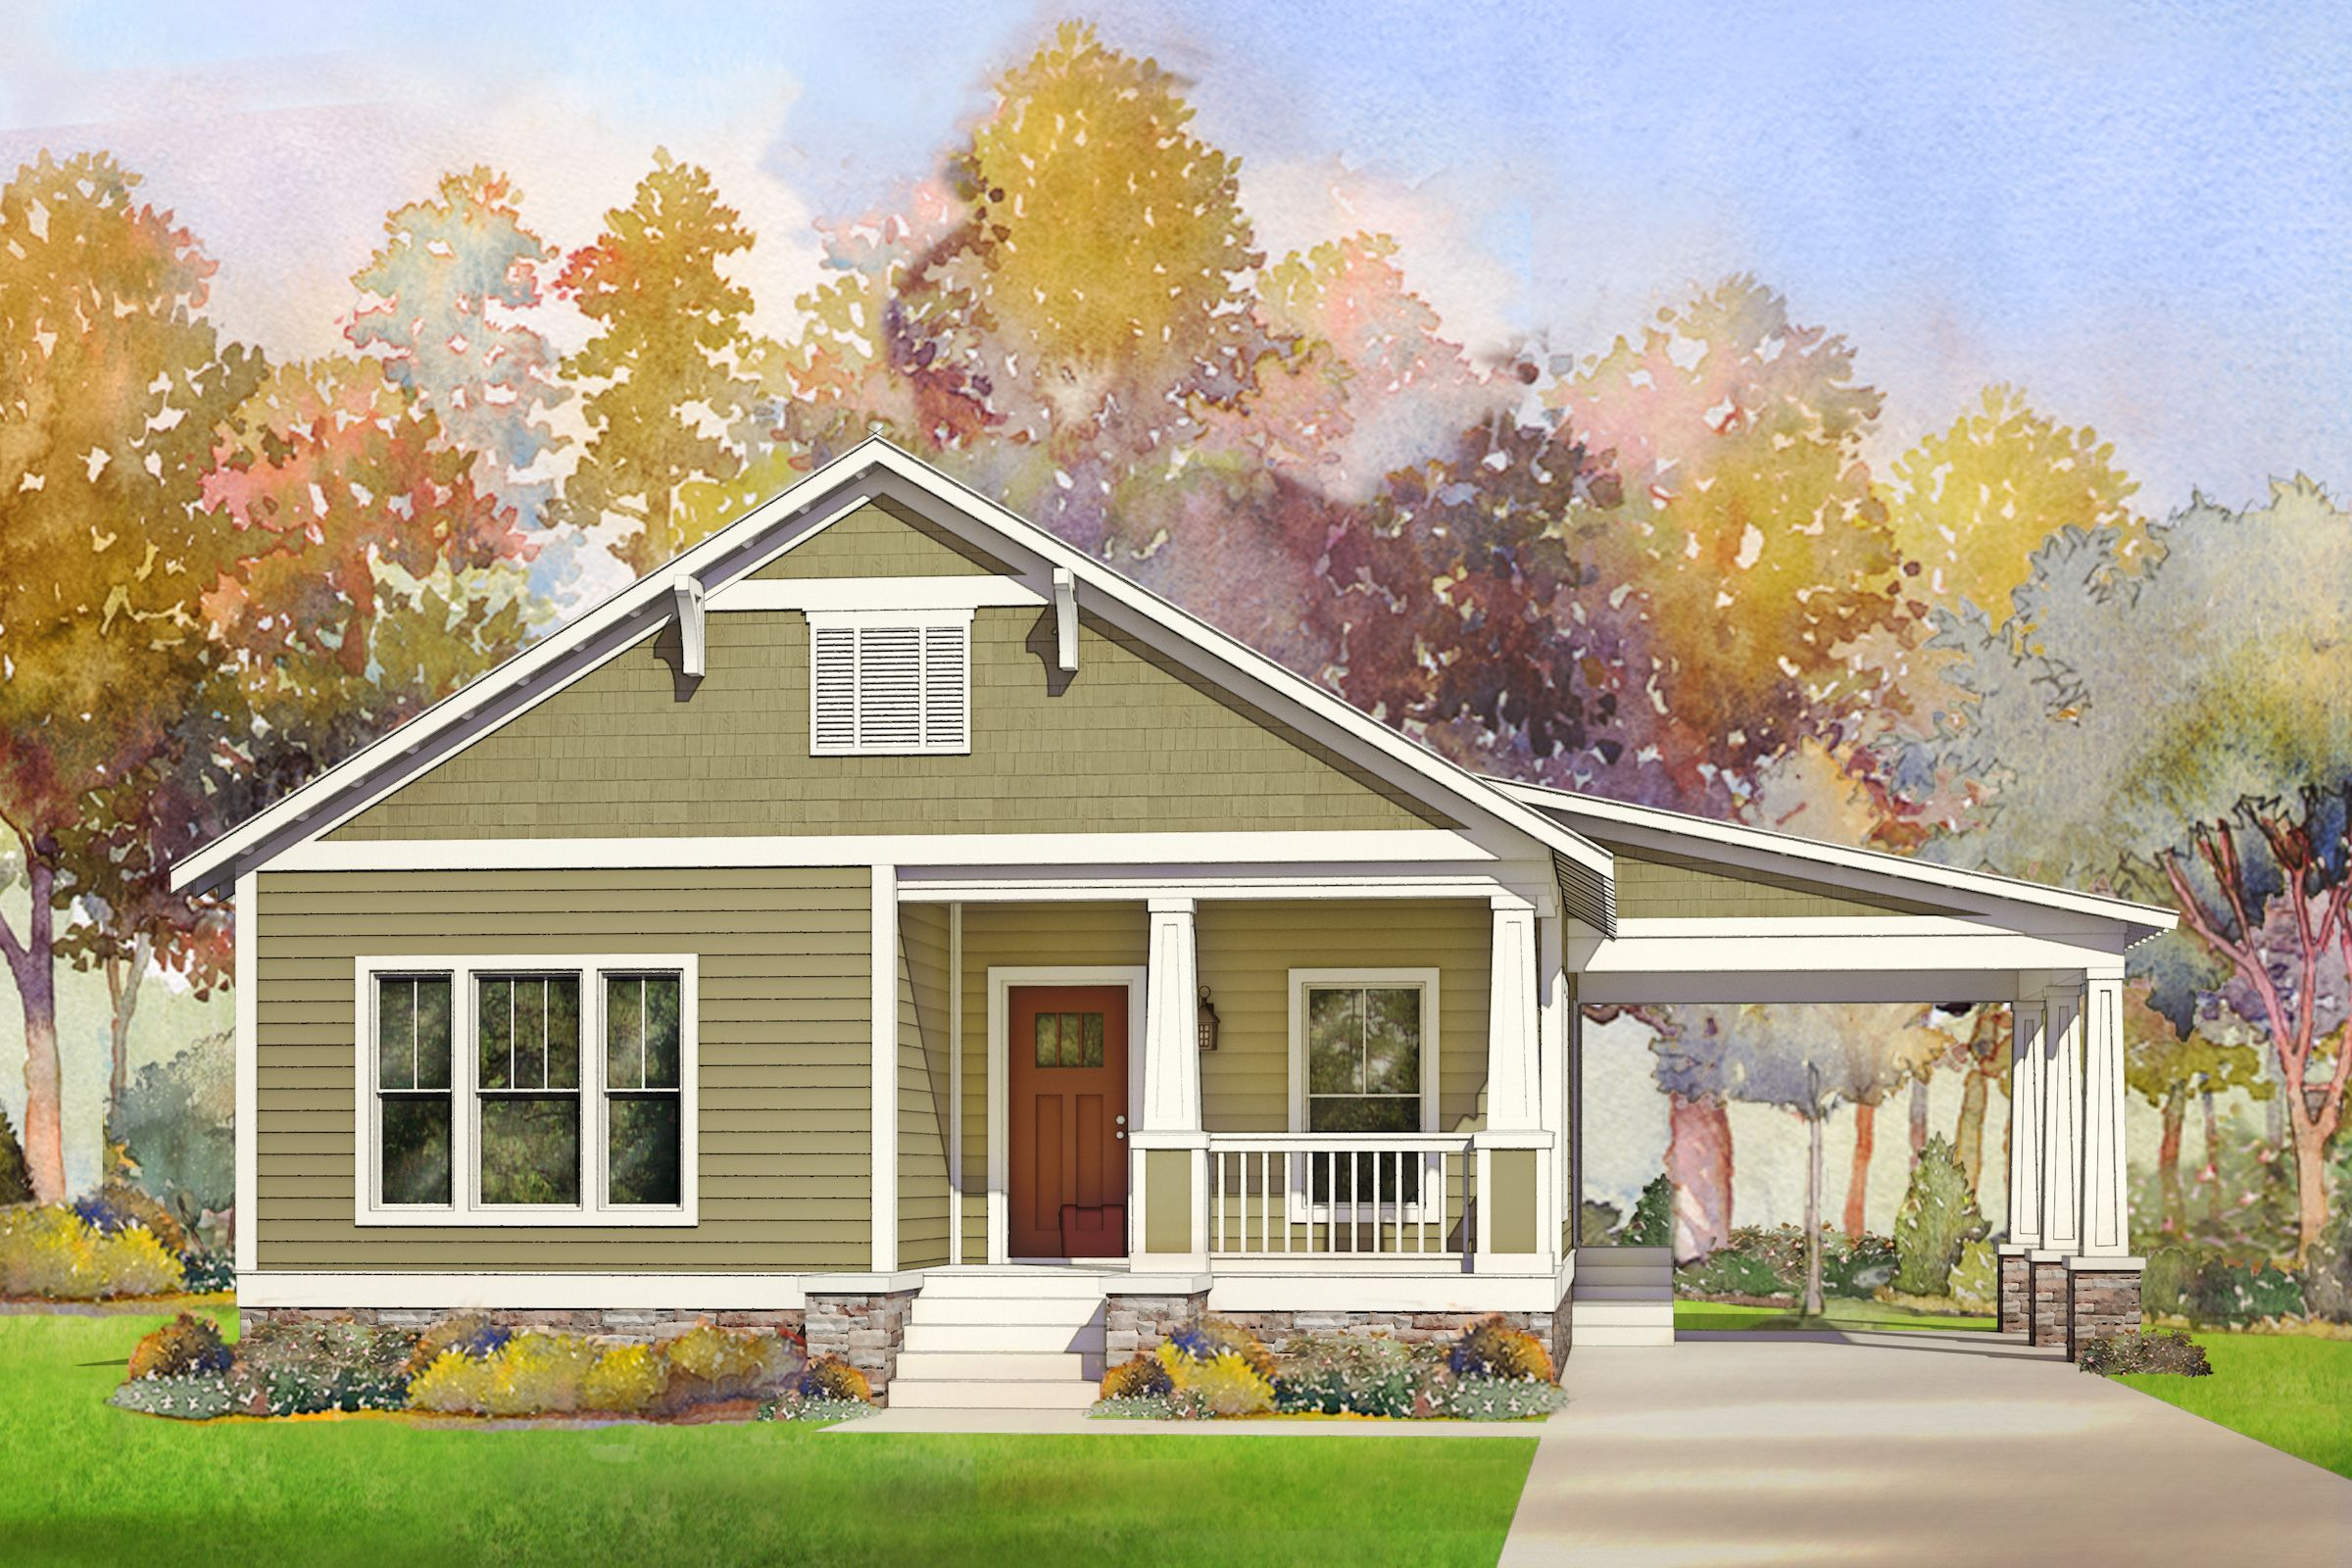 wickliffe modular home rendering